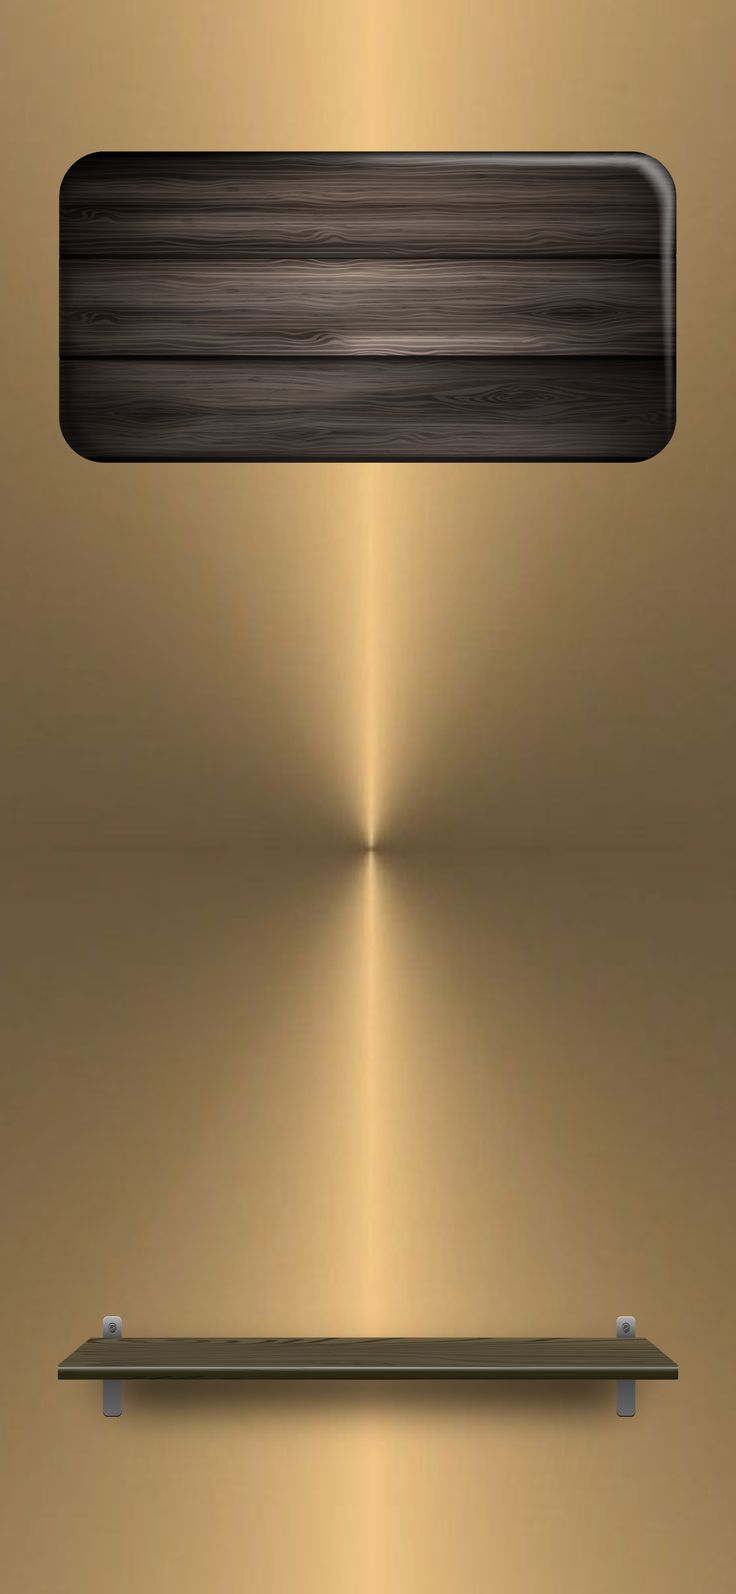 wallpaper iphone x